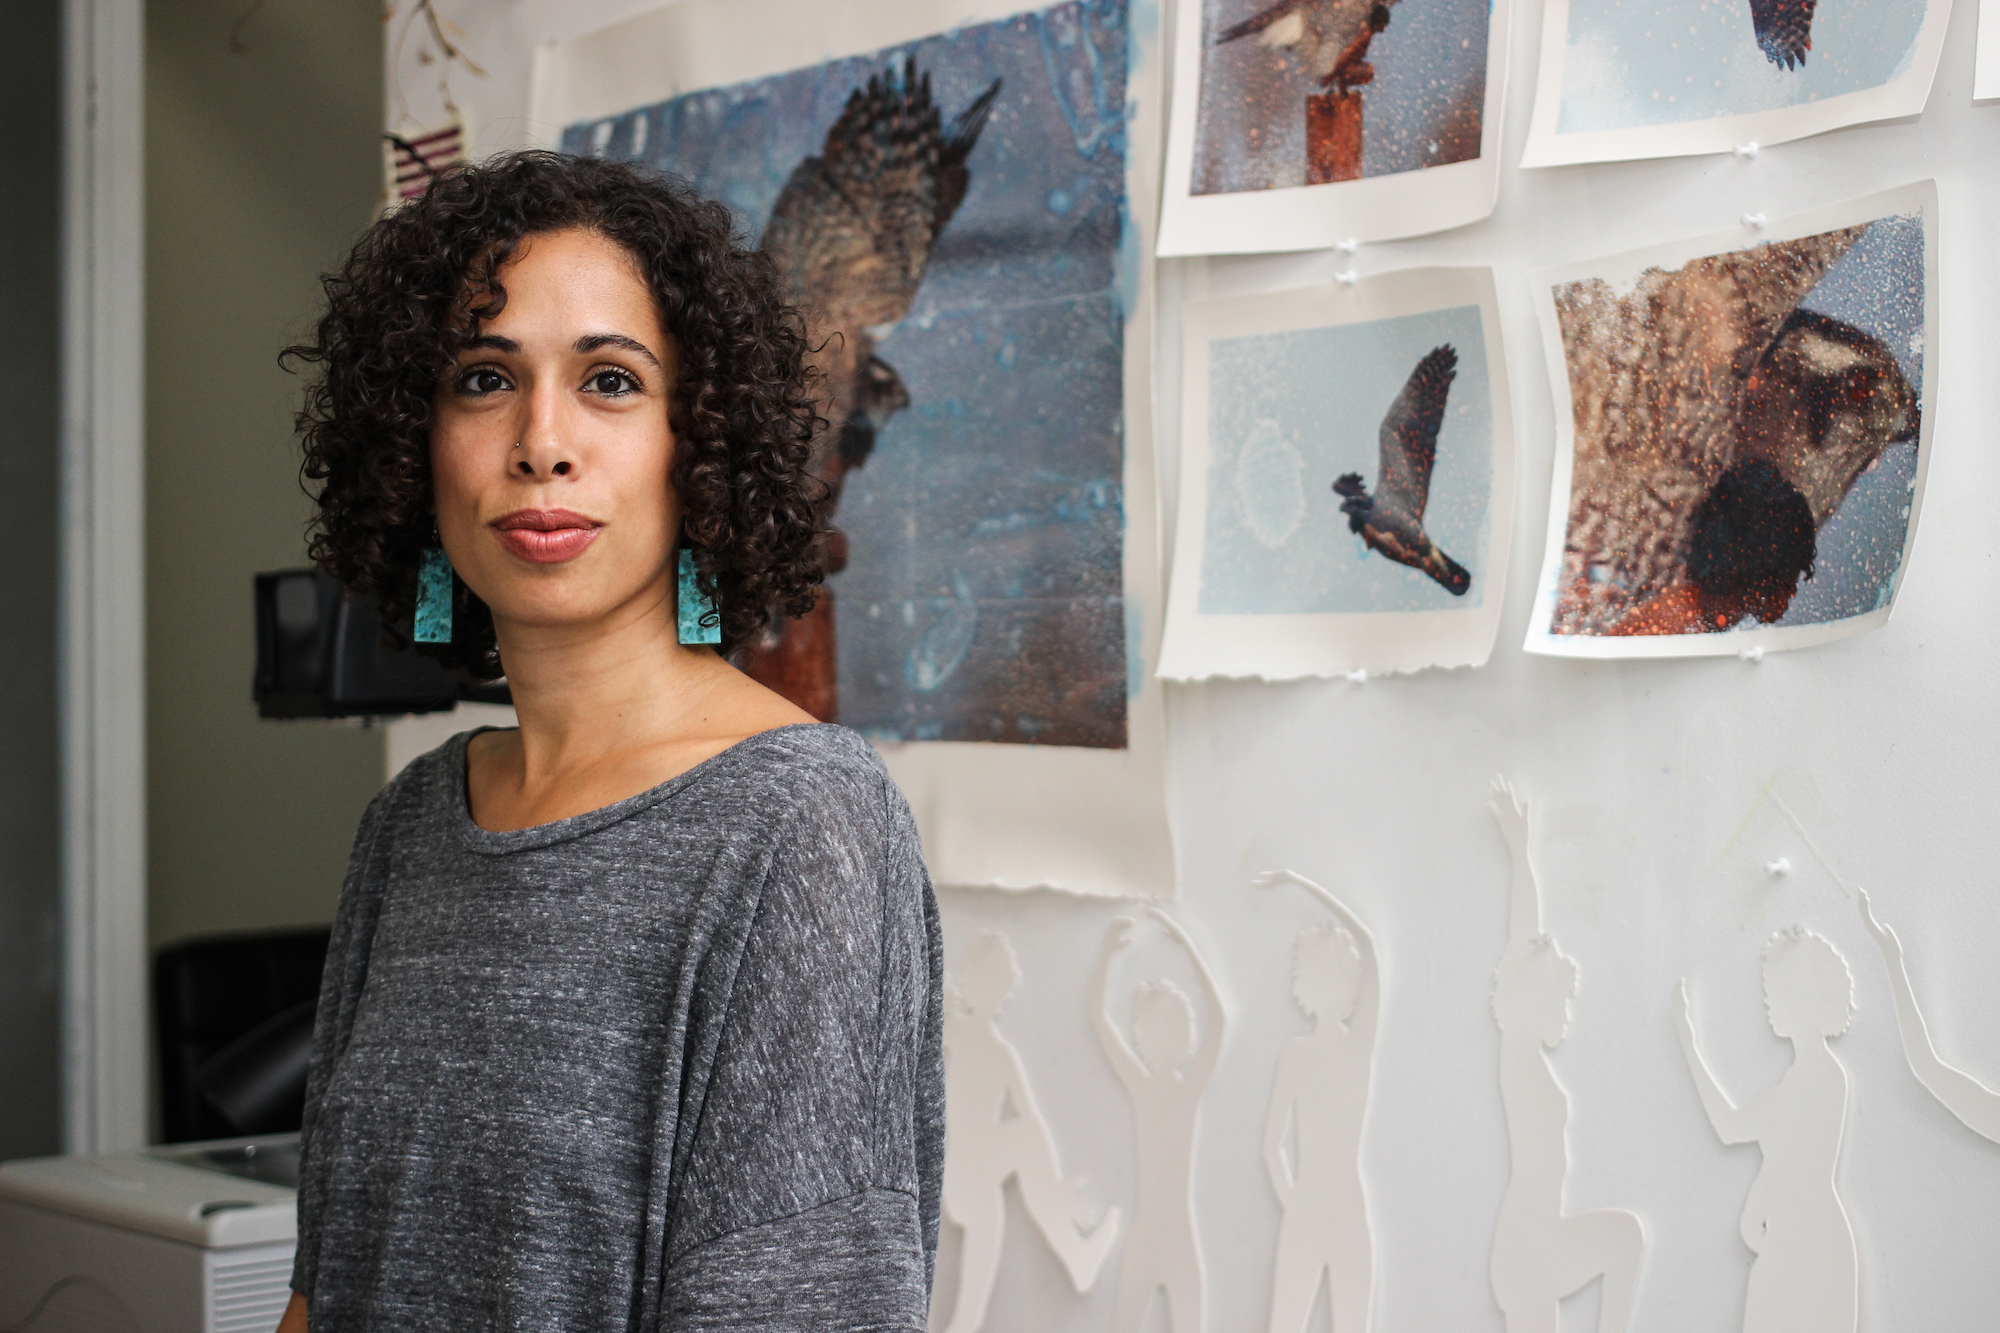 Jessica Maffia - Visual Artist based in NYC